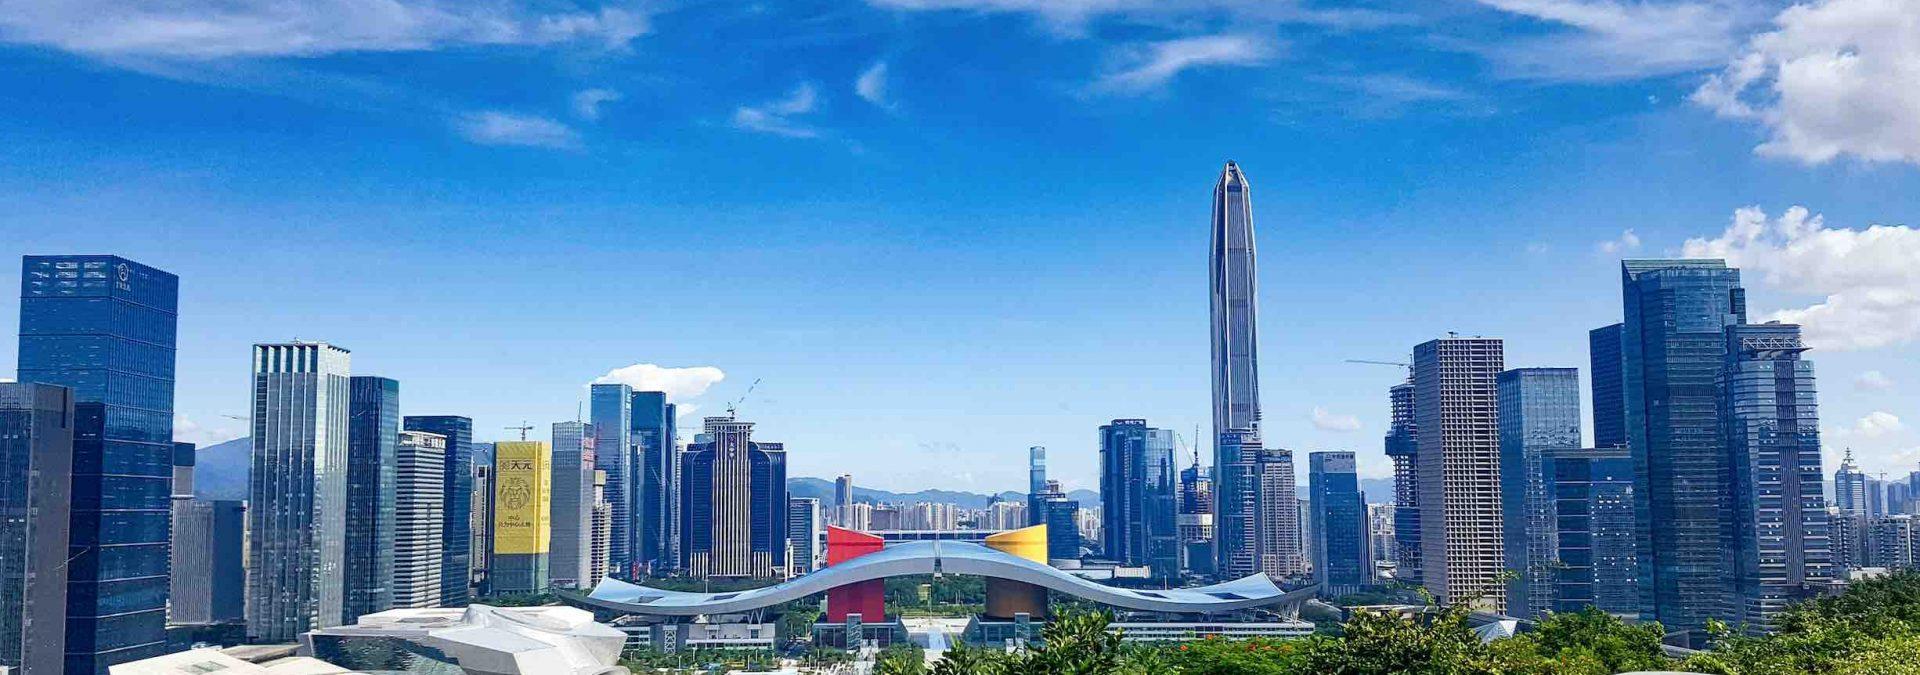 Shenzhen Vcan